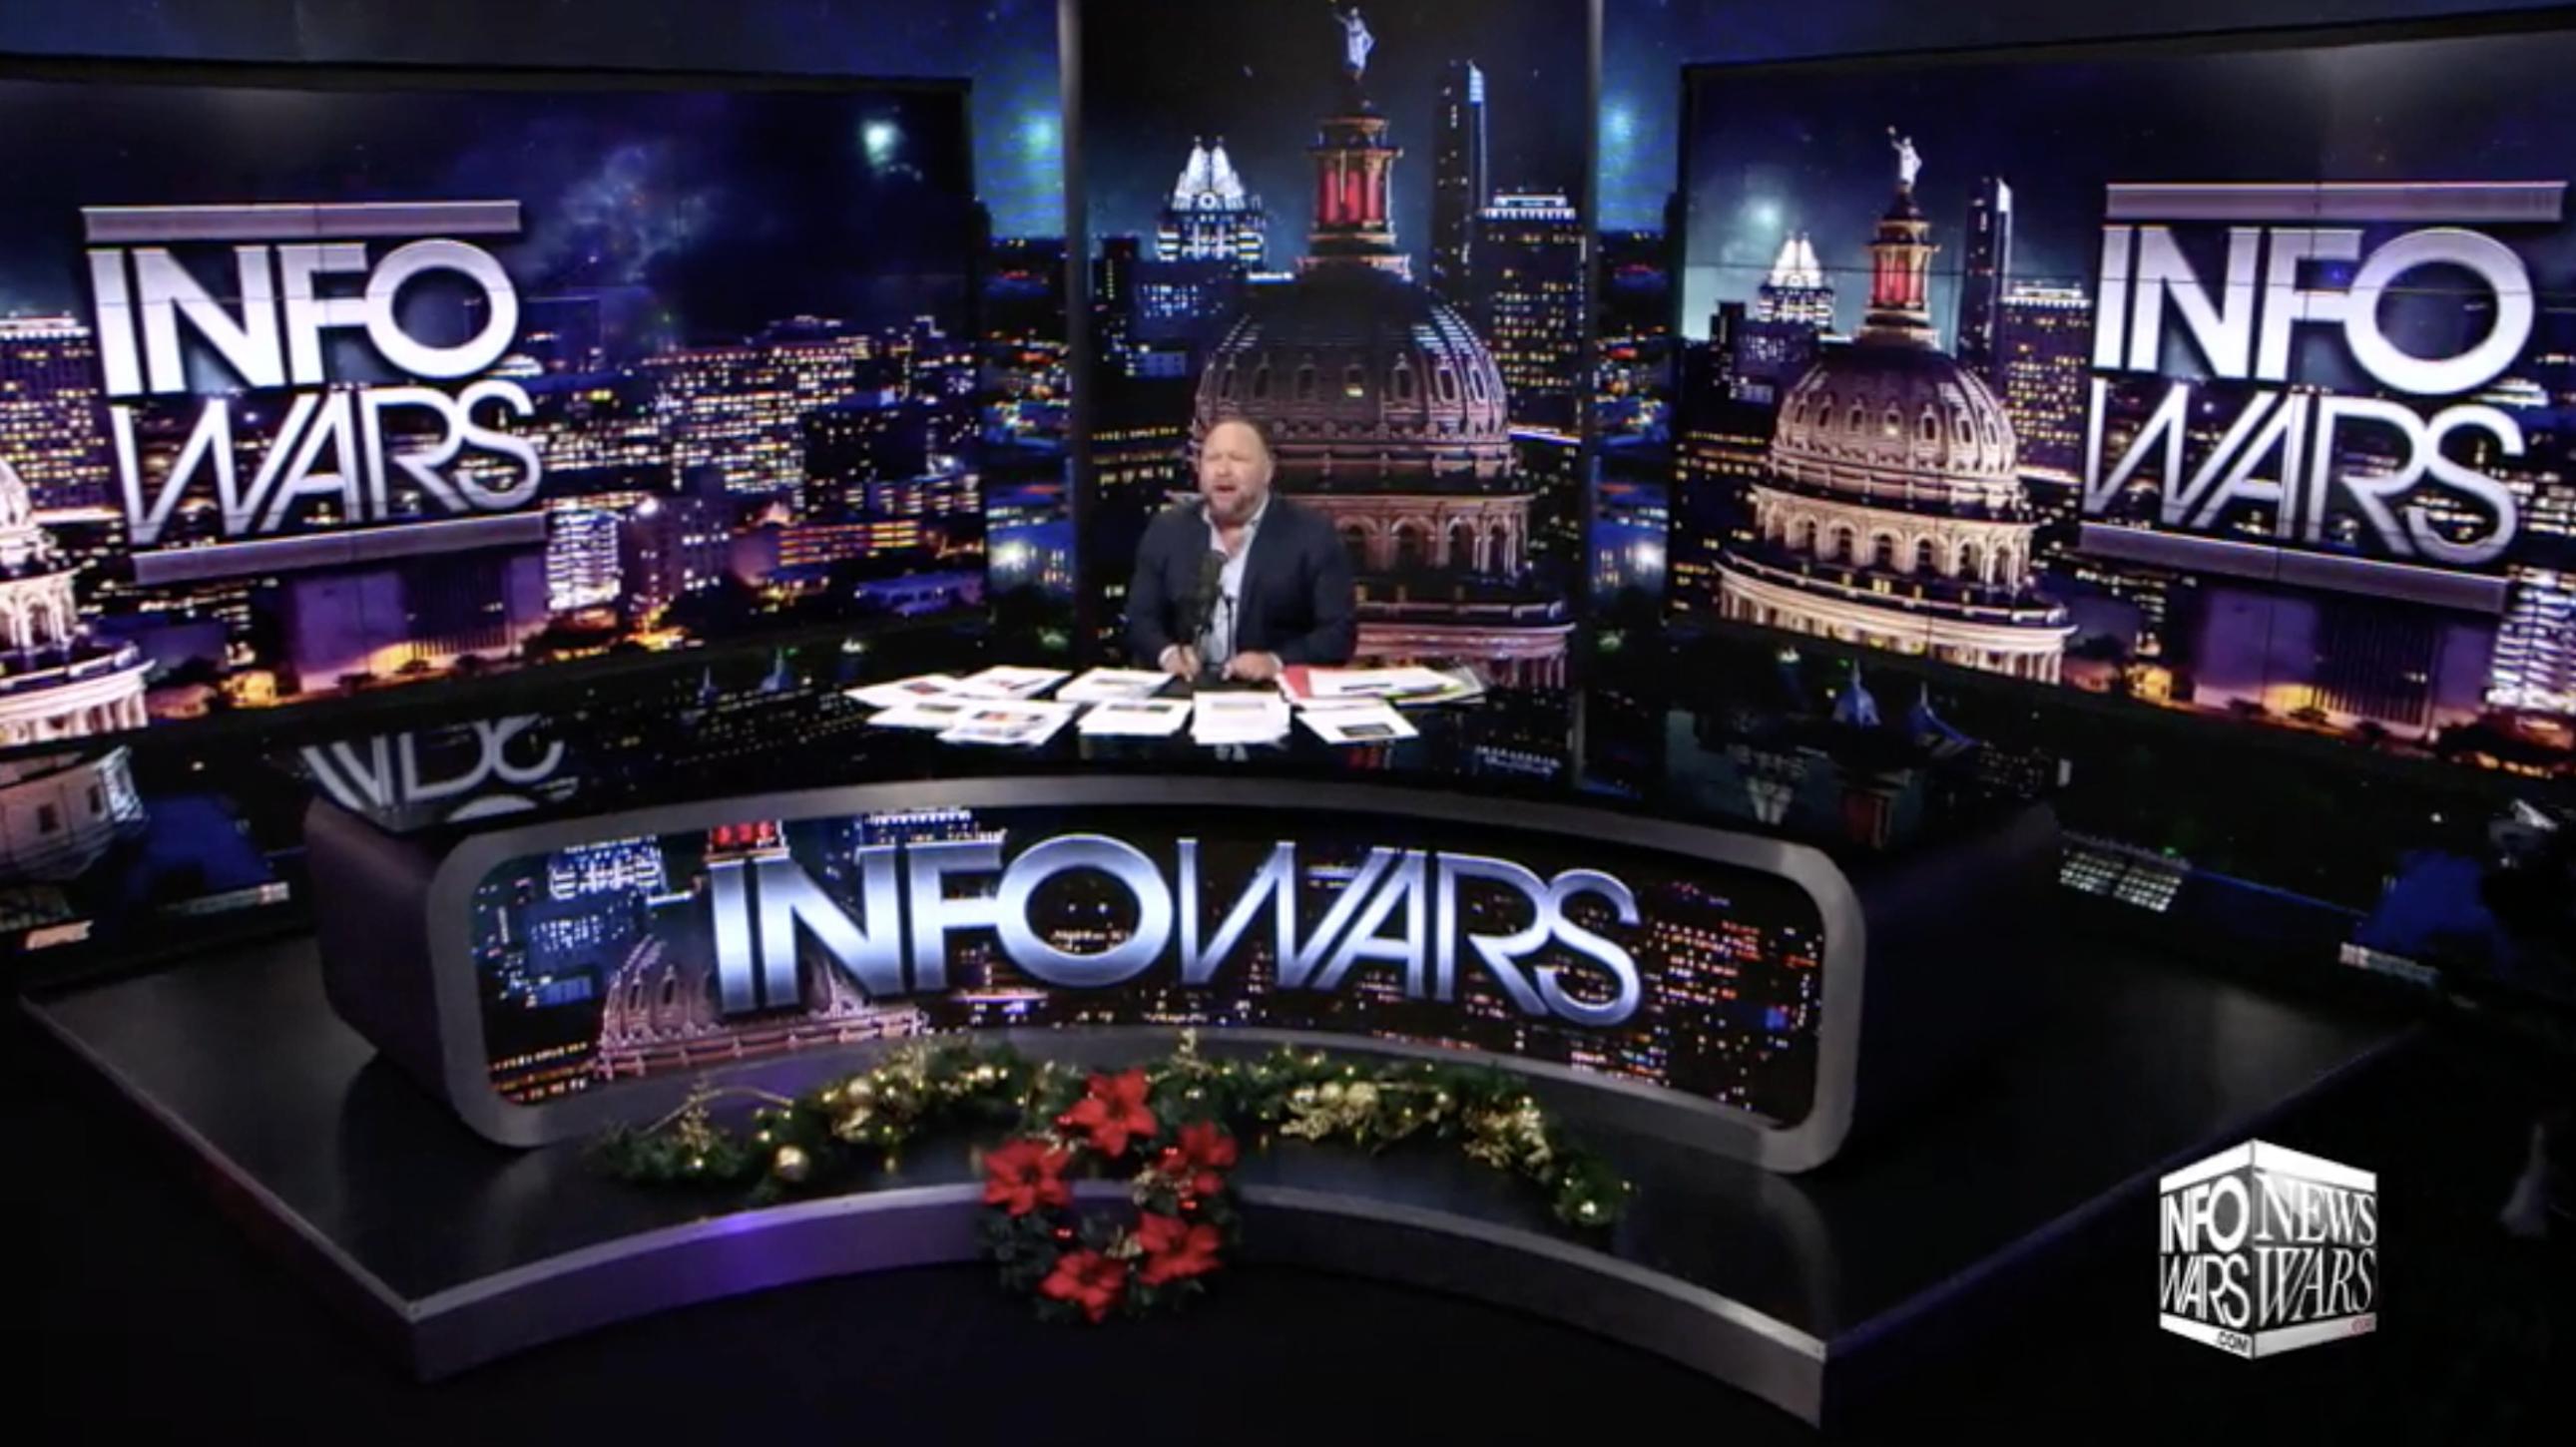 Alex Jones Infowars Studio Christmas EXZM Zack Mount December 10th 2020